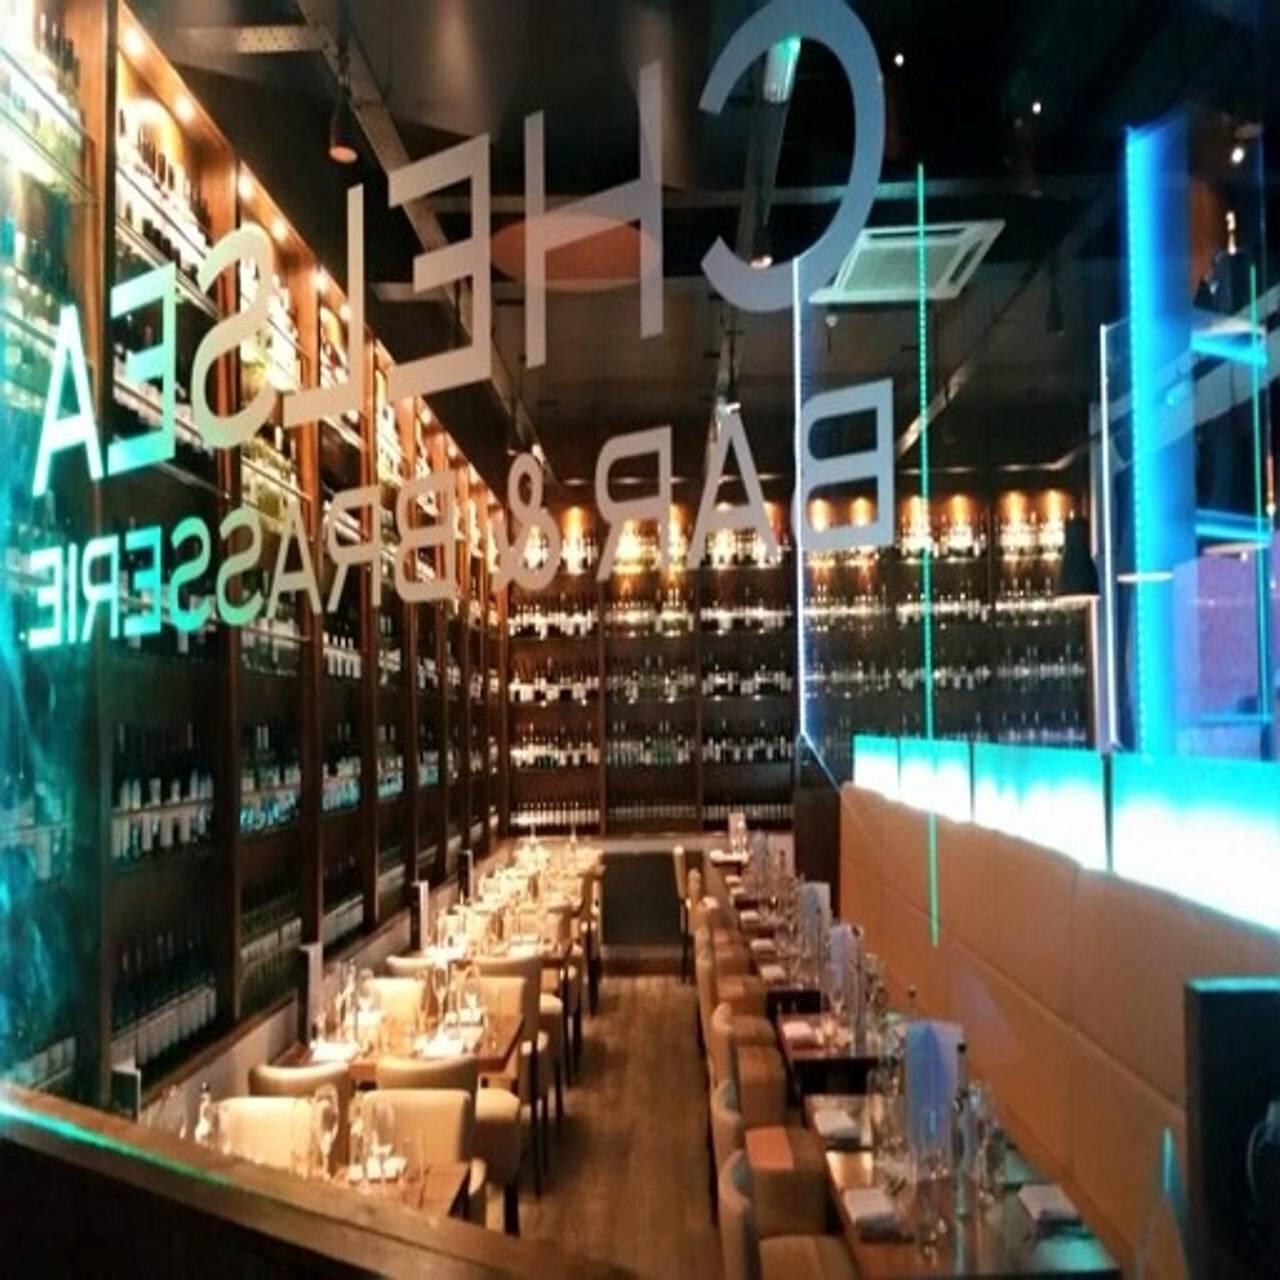 Chelsea bar brasserie restaurant cheltenham gloucestershire 1 photosview more m4hsunfo